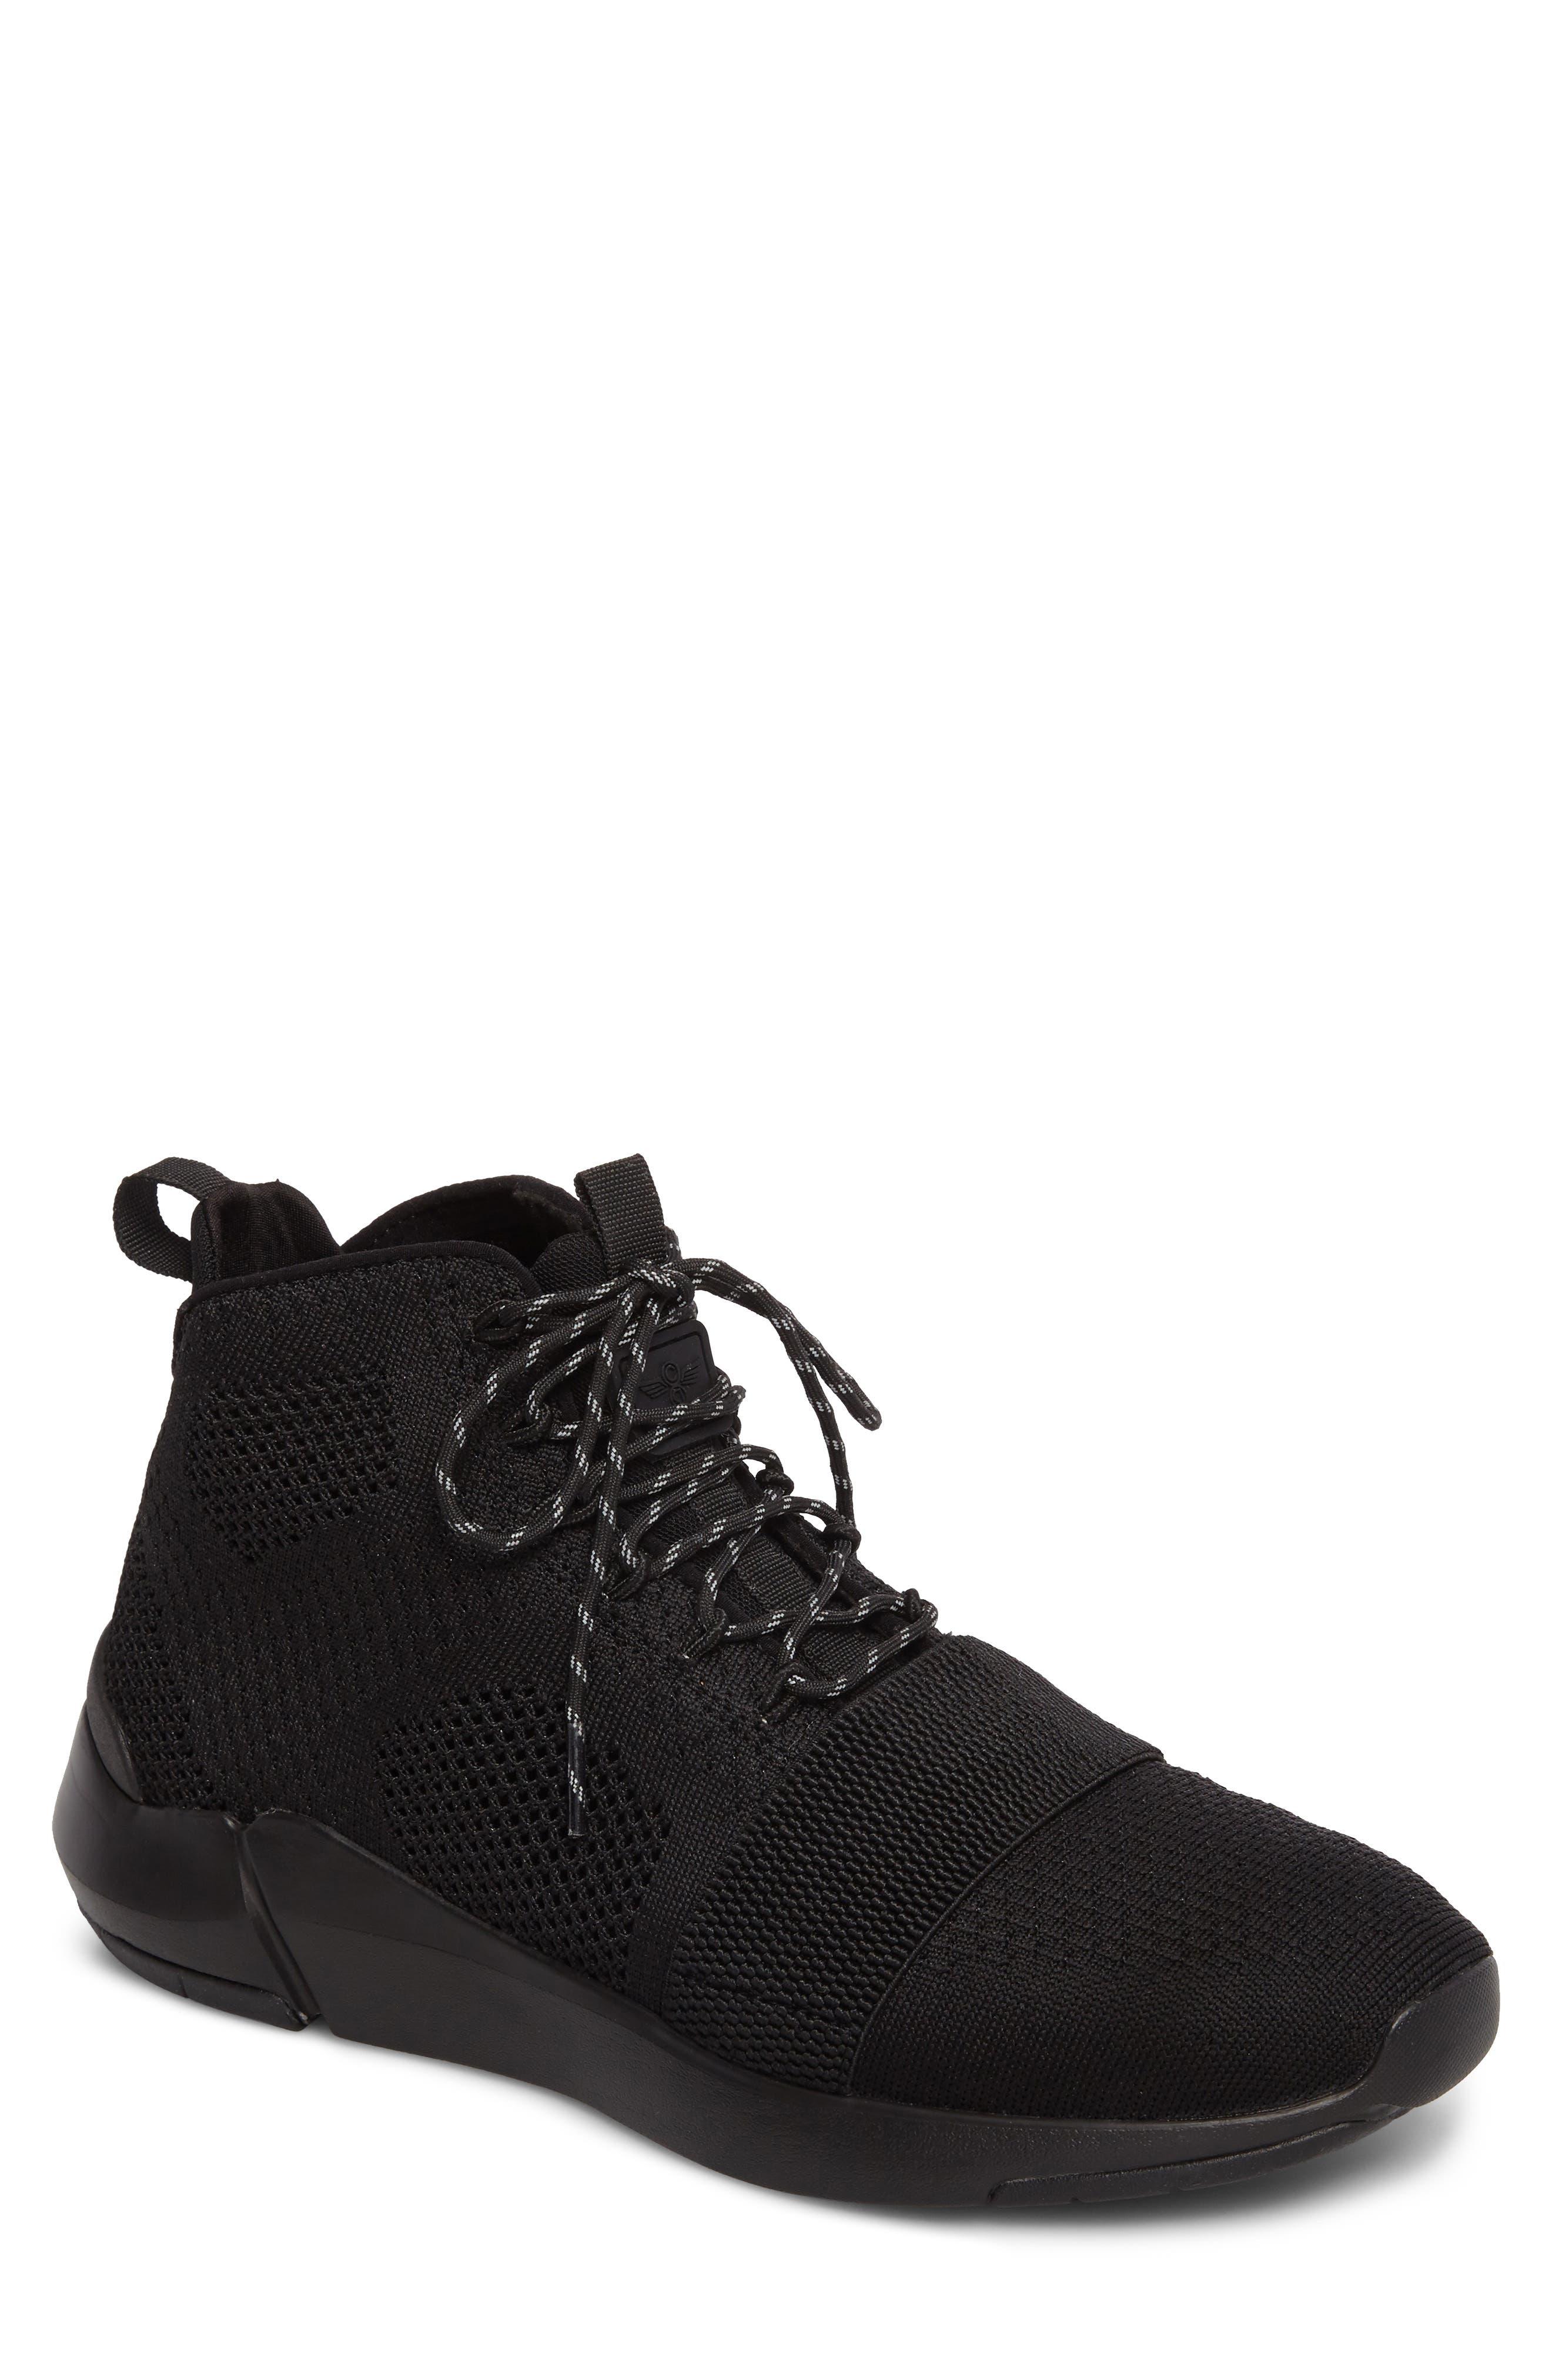 Main Image - Creative Recreation Modica Sneaker (Men)